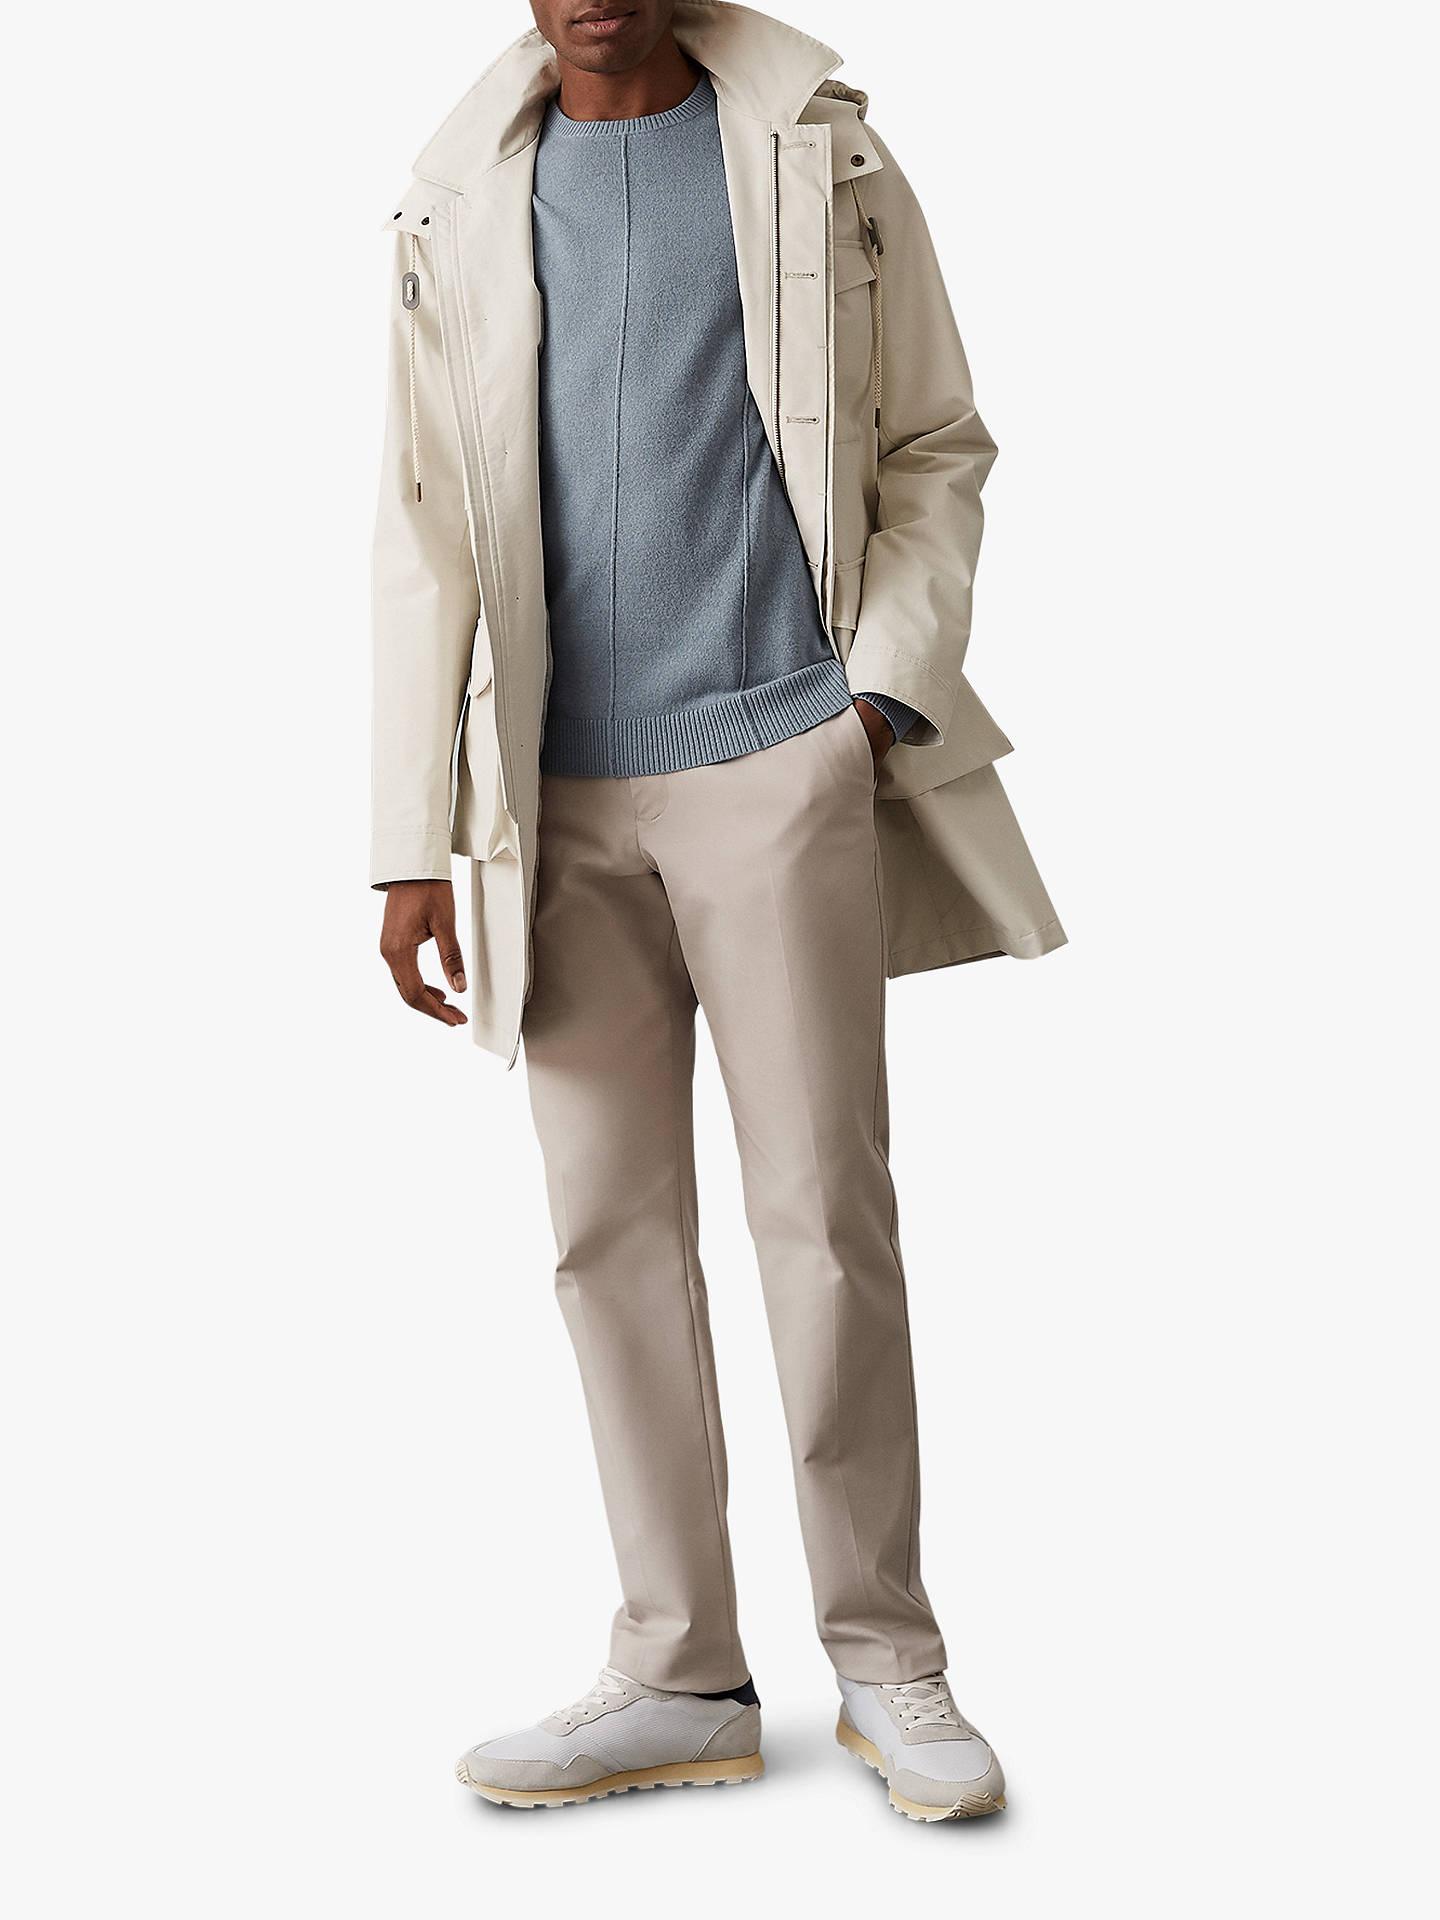 c64098c3411 ... Buy Reiss Champion Wool Cashmere Jumper, Airforce Blue, XL Online at  johnlewis.com ...